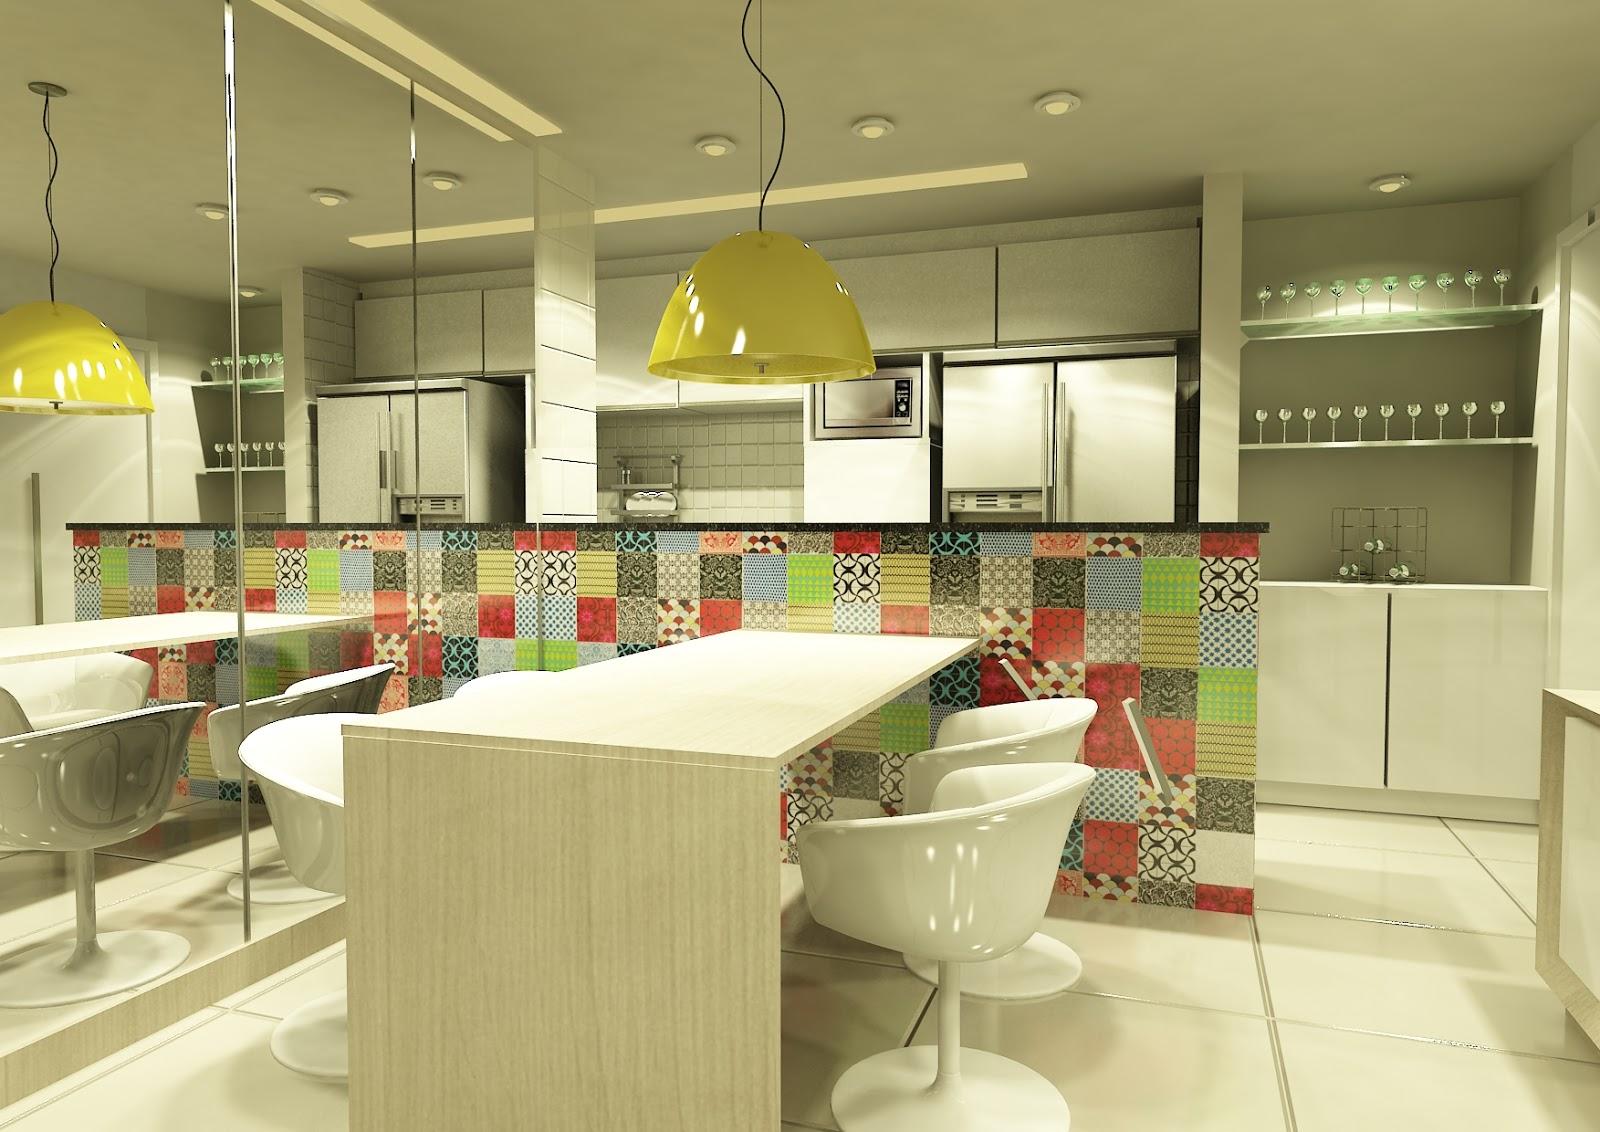 cozinha americana 01 jpg 1600 cozinha americana  01 jpg 1600 1132 see  #A8A023 1600 1132